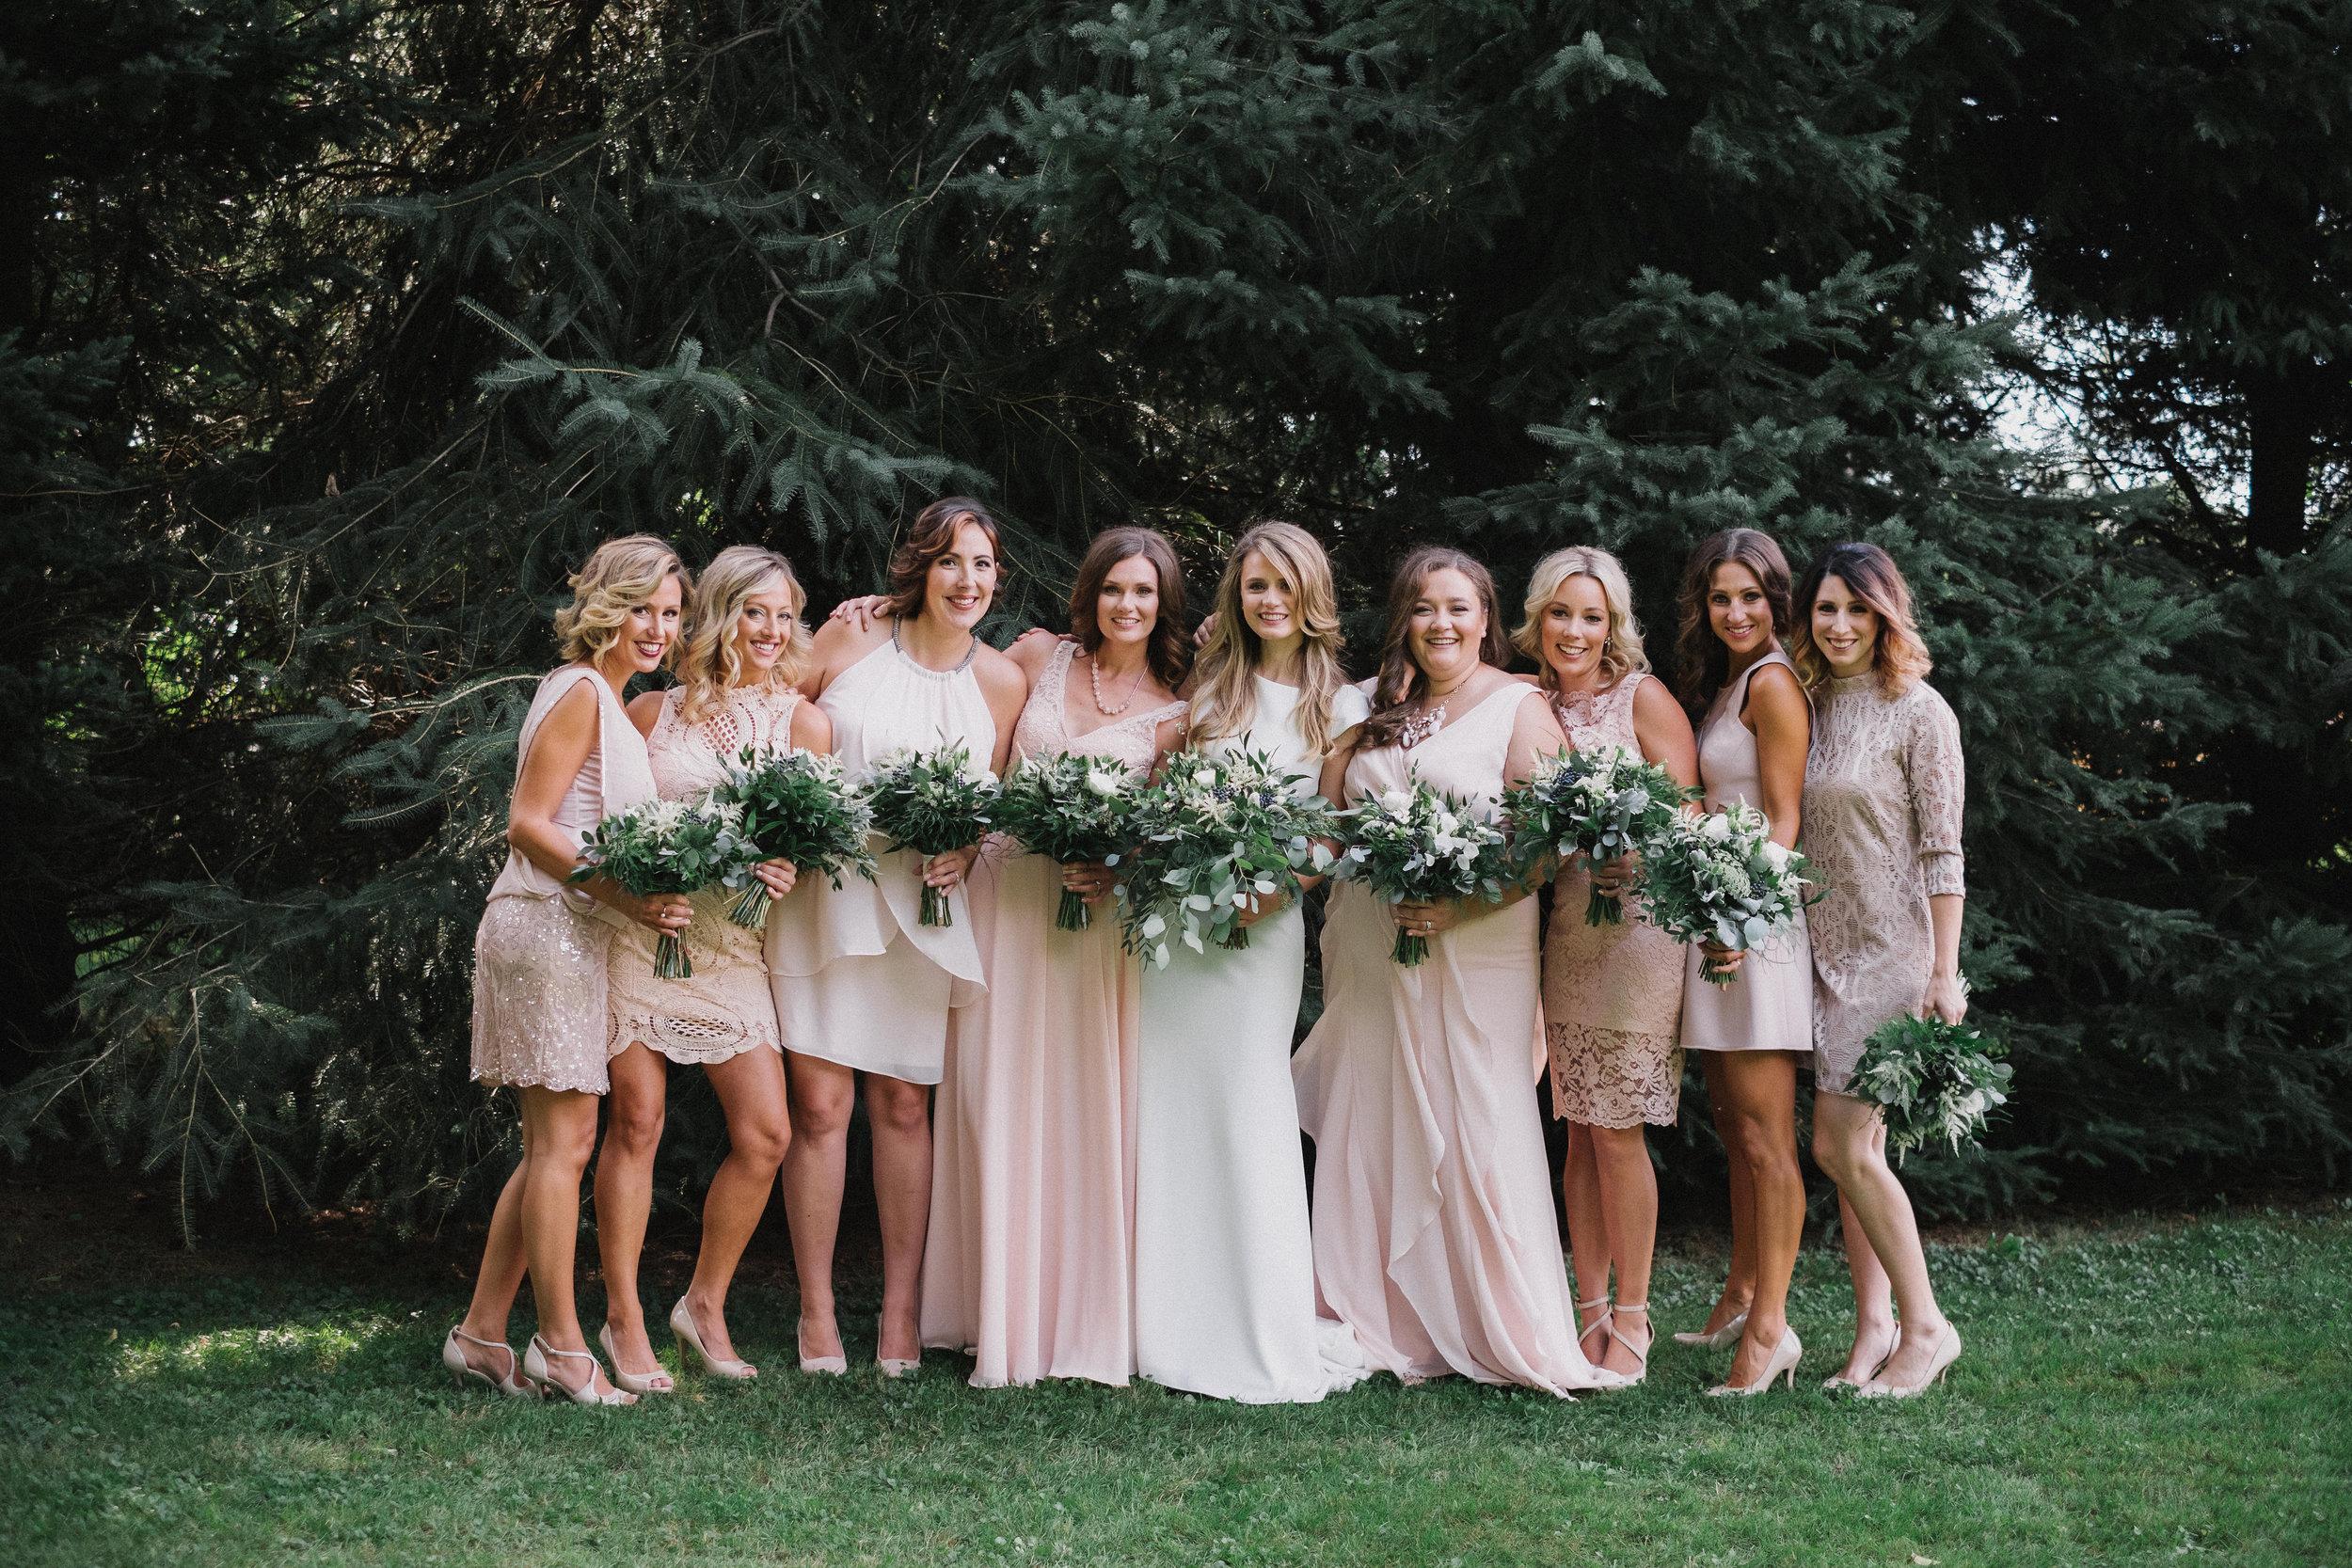 Danika-Mike-Veerman-Wedding-Spice-Factory-Hamilton-INLY-Events-TJ-Tindale-224.jpg